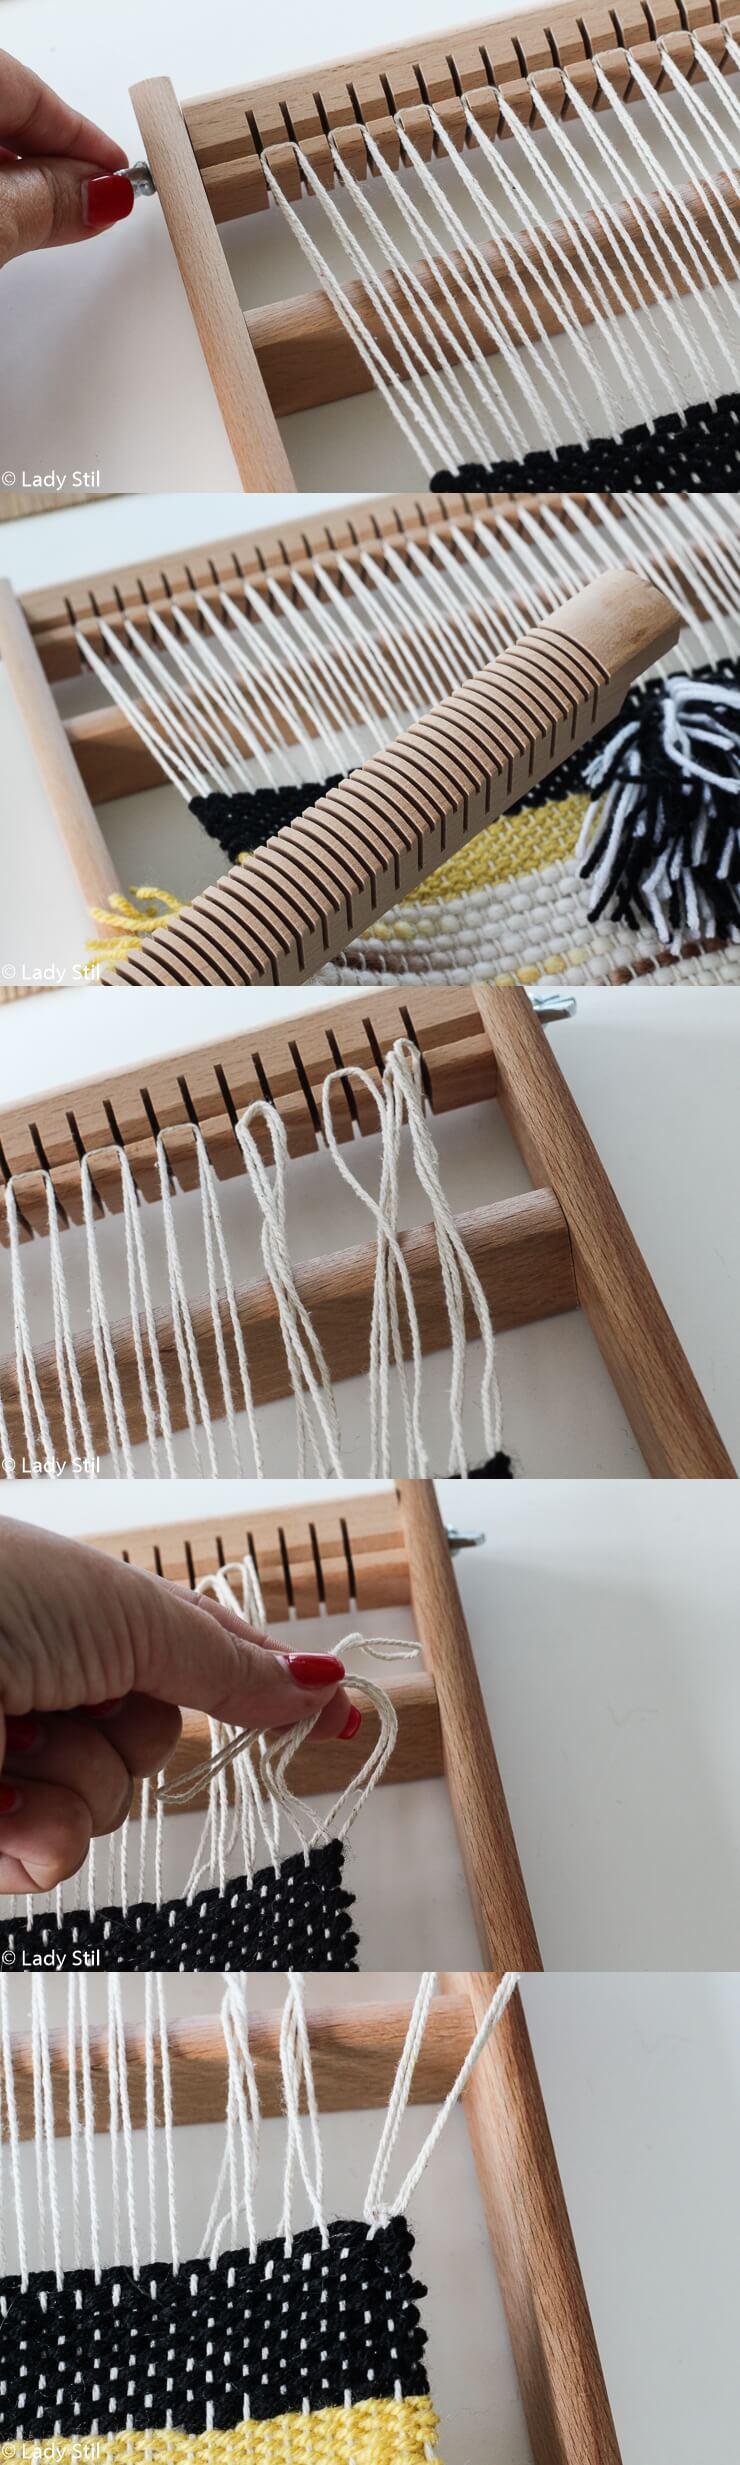 DIY Wandteppich weben